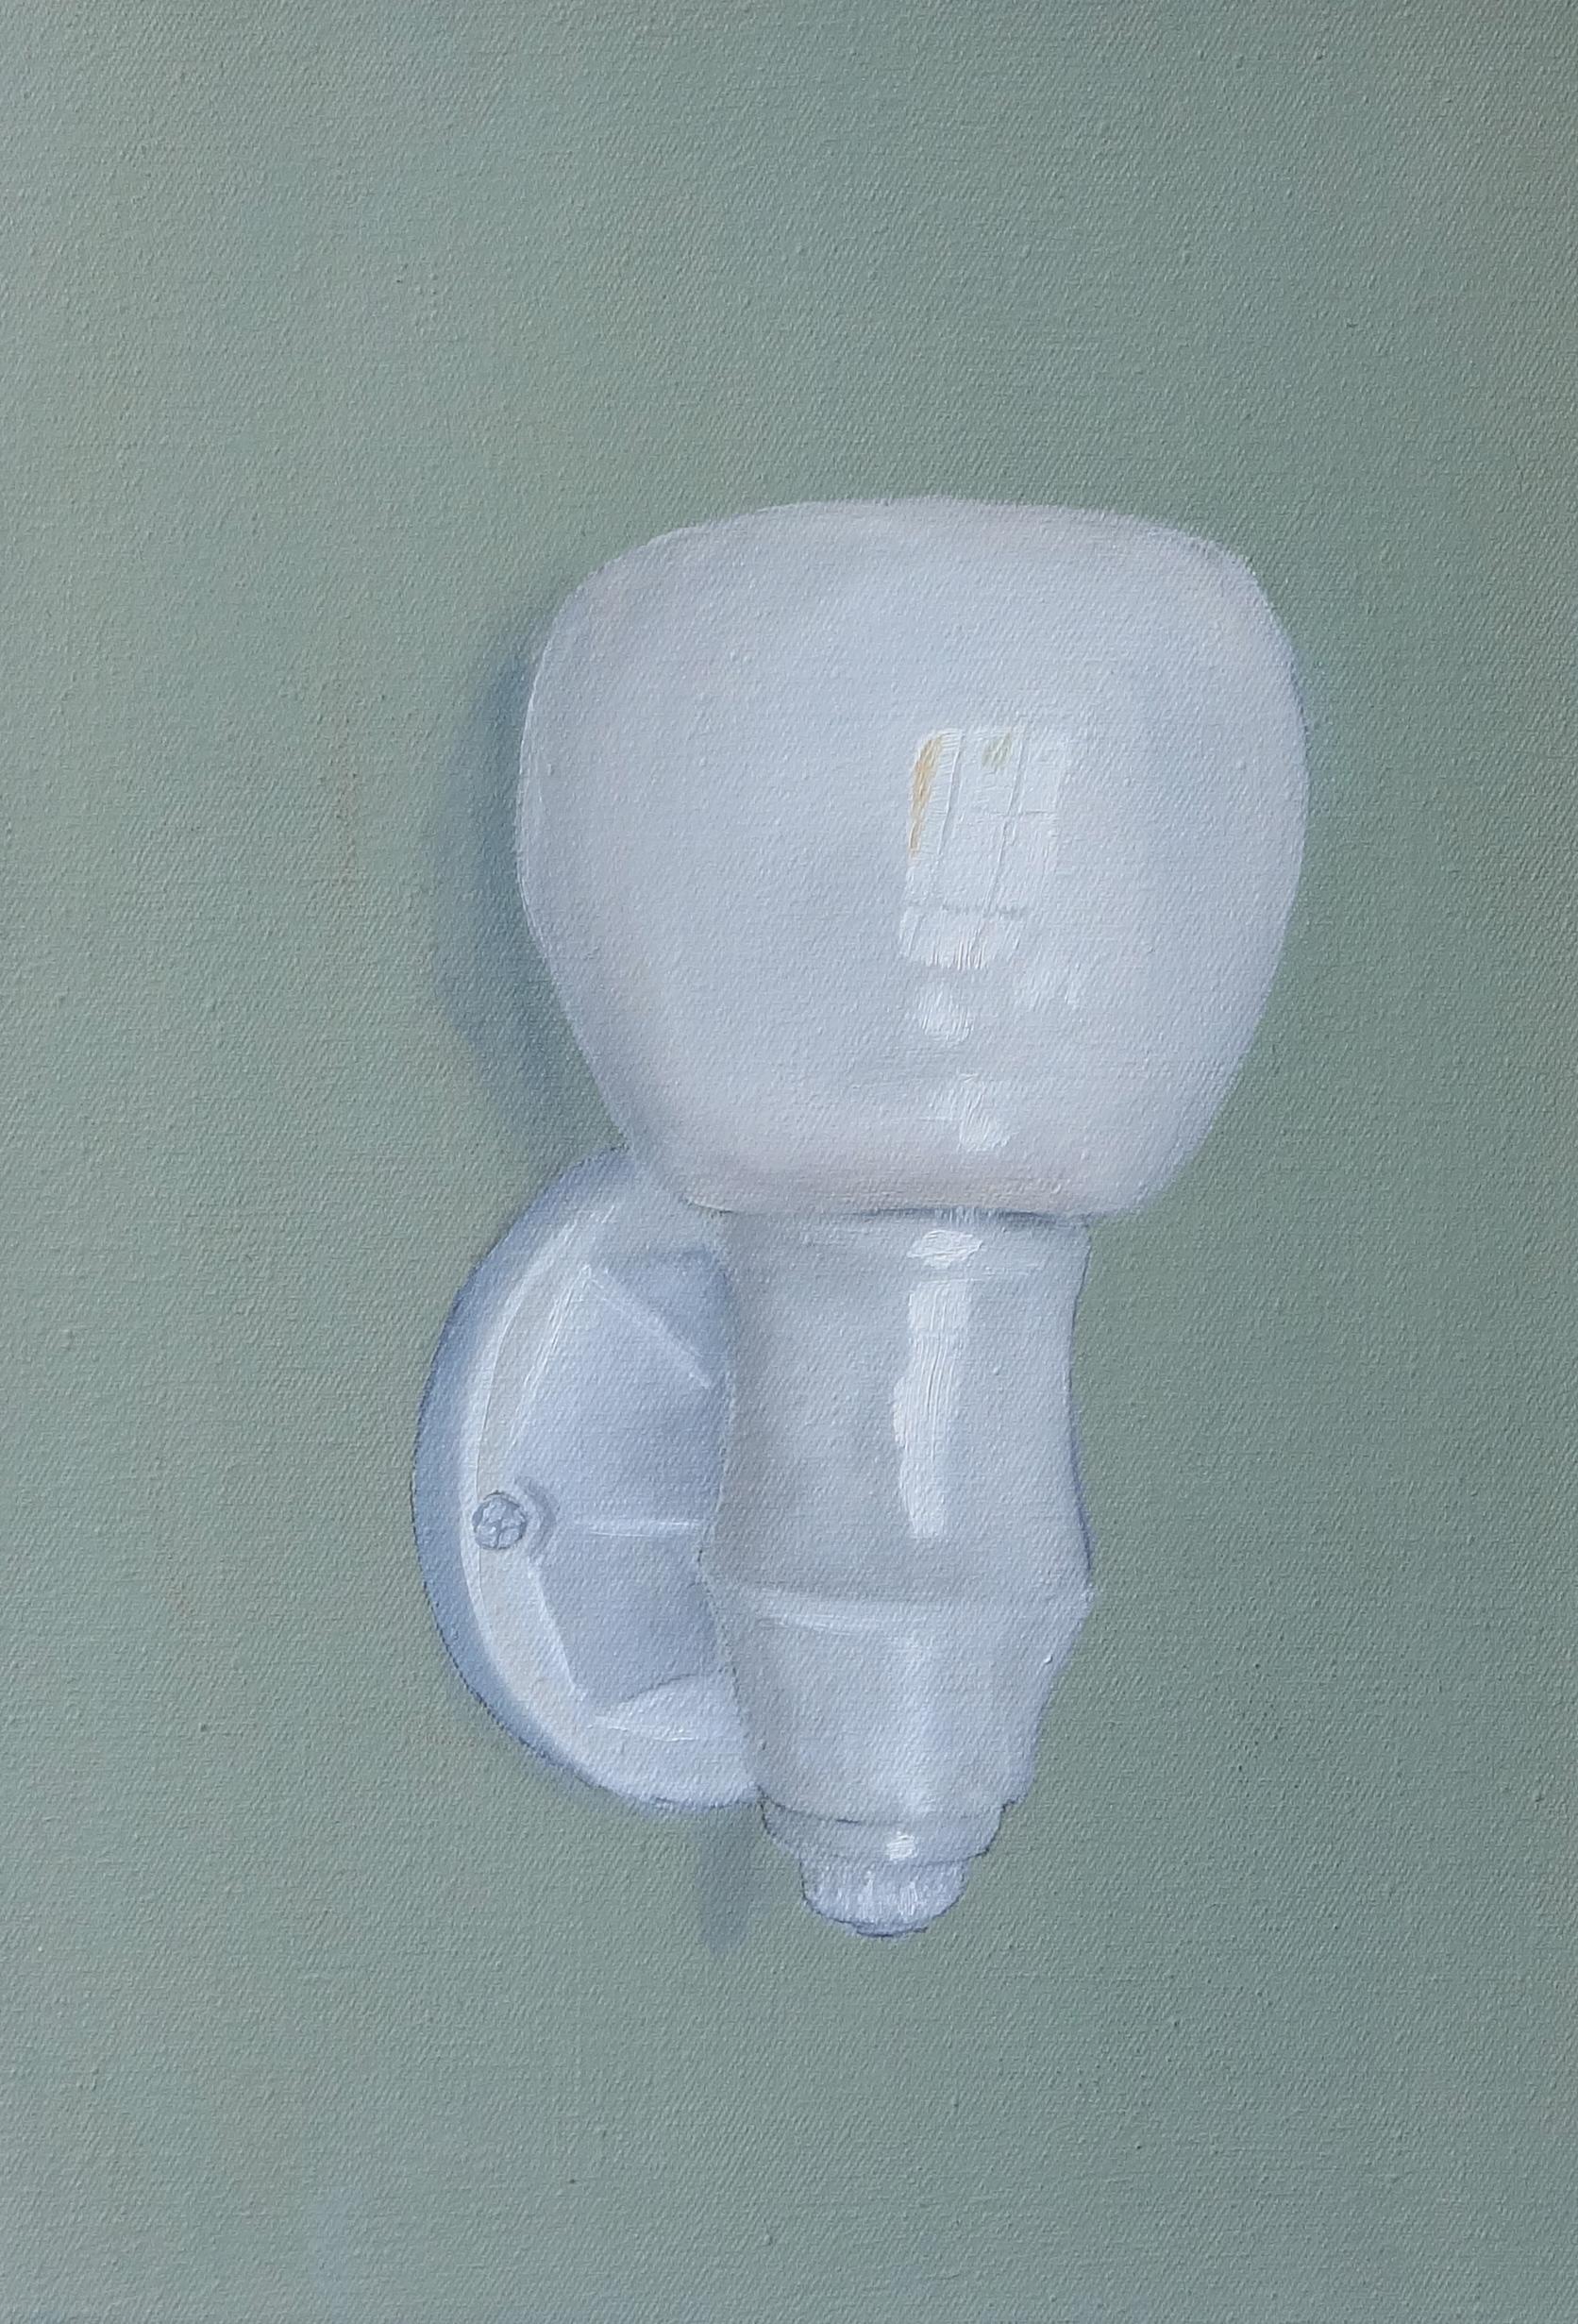 La lampada 20 x 28 cmjpg